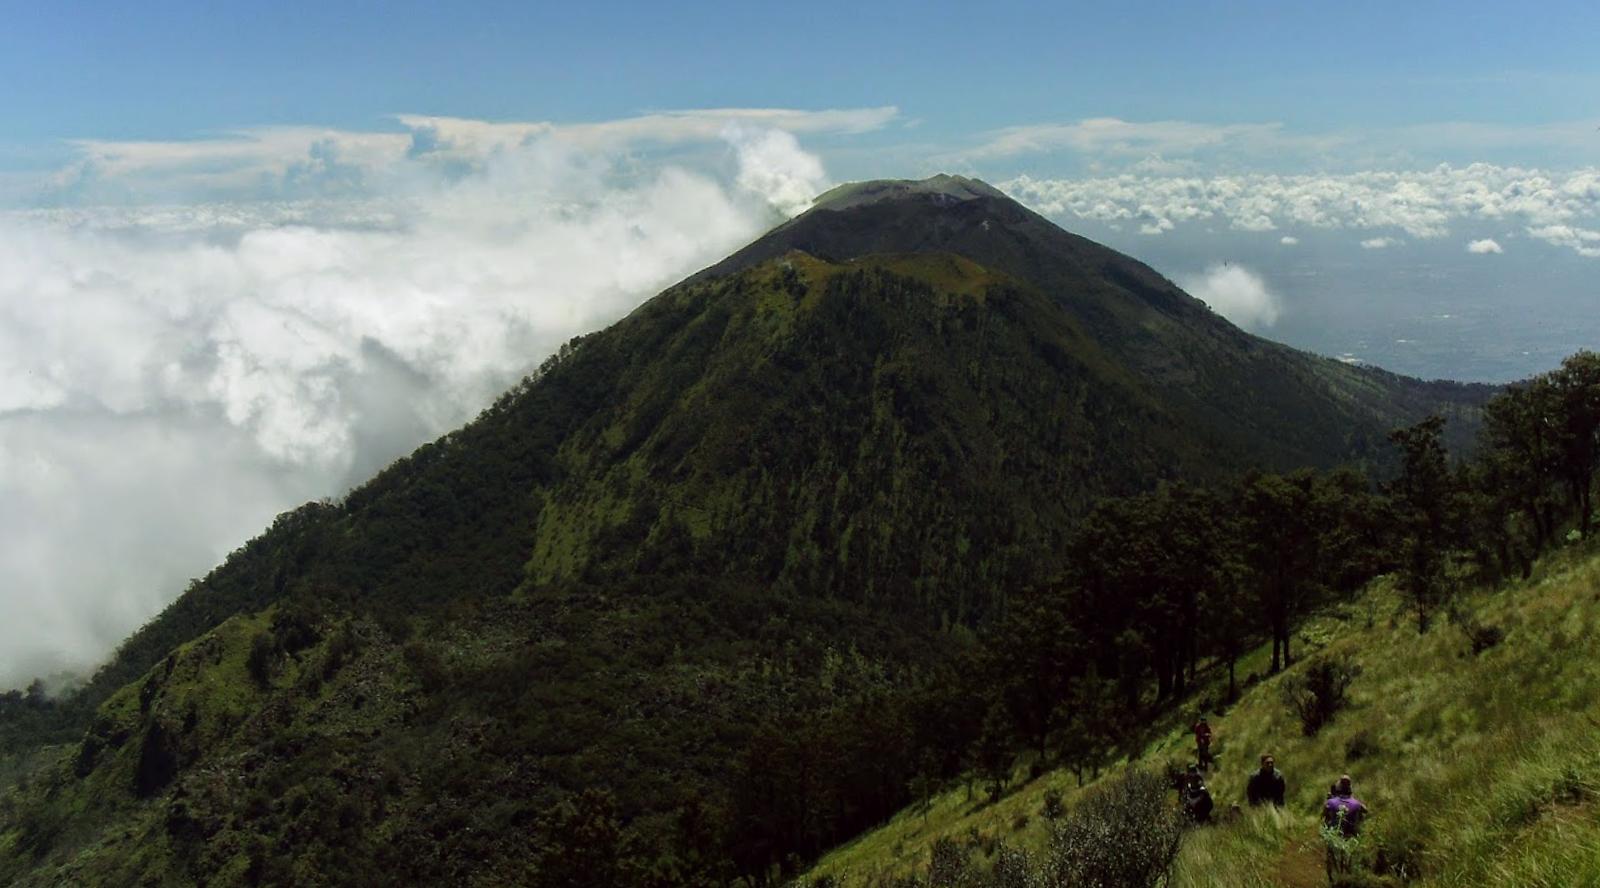 Padang cantik pemandangan Gunung Suket (2.950 mdpl) - Banyuwangi